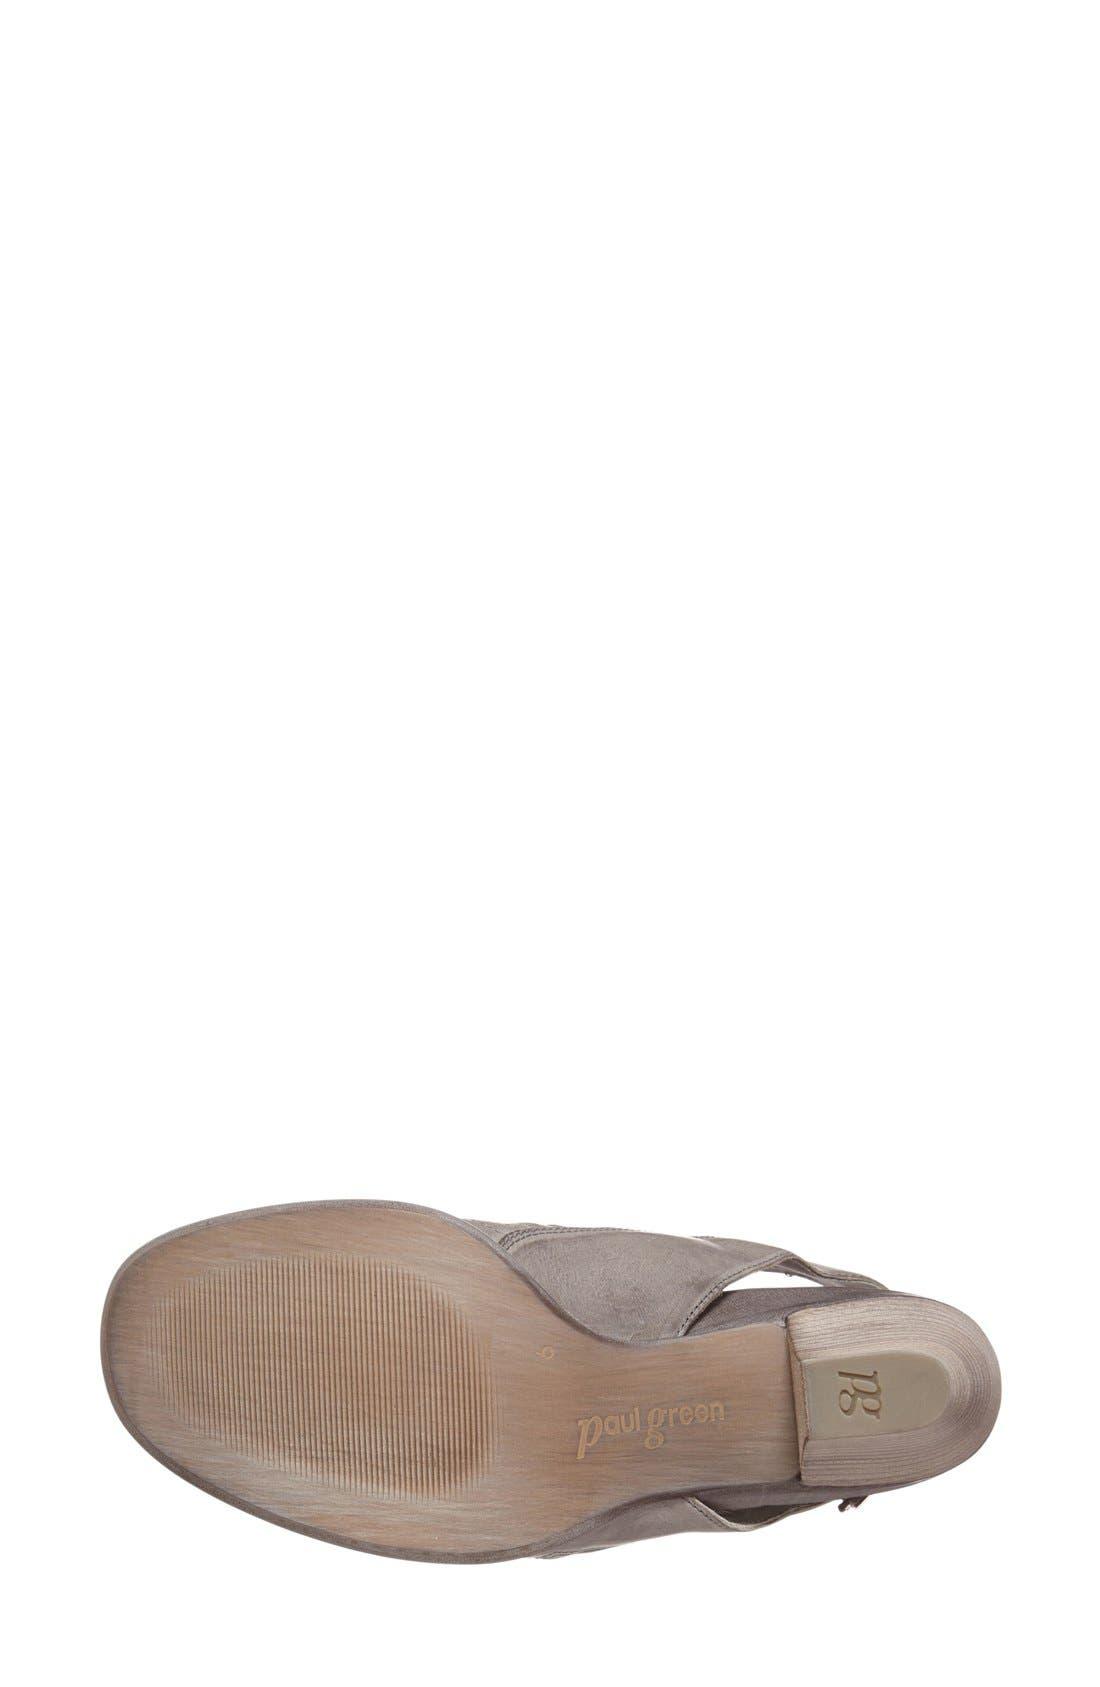 'Cayanne' Leather Peep Toe Sandal,                             Alternate thumbnail 25, color,